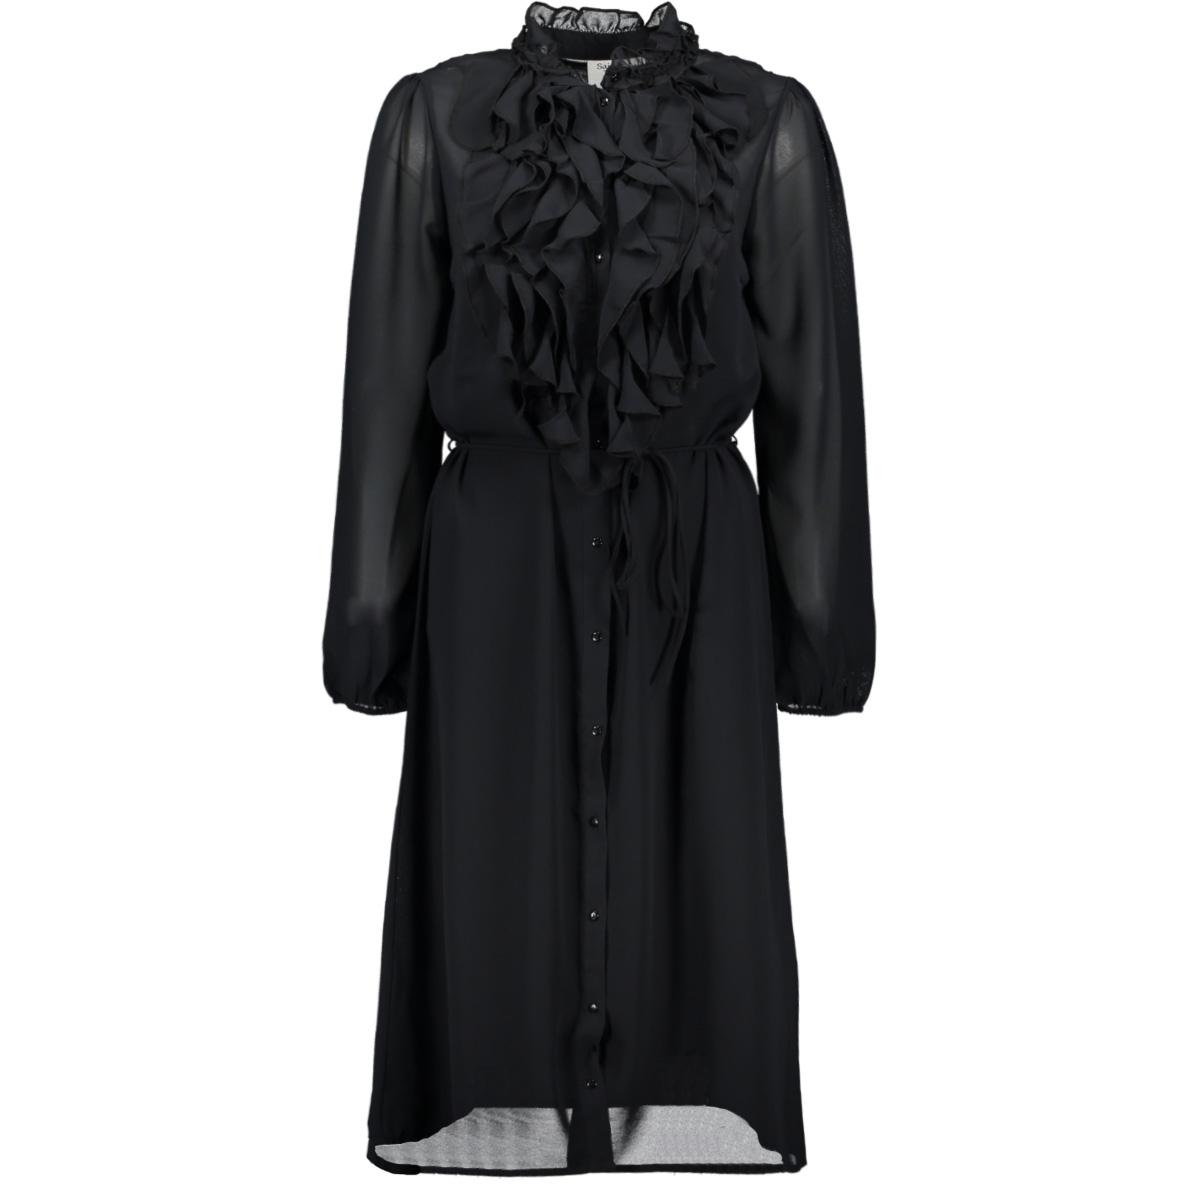 lilly sz dress 30510378 saint tropez jurk 19 3911 black